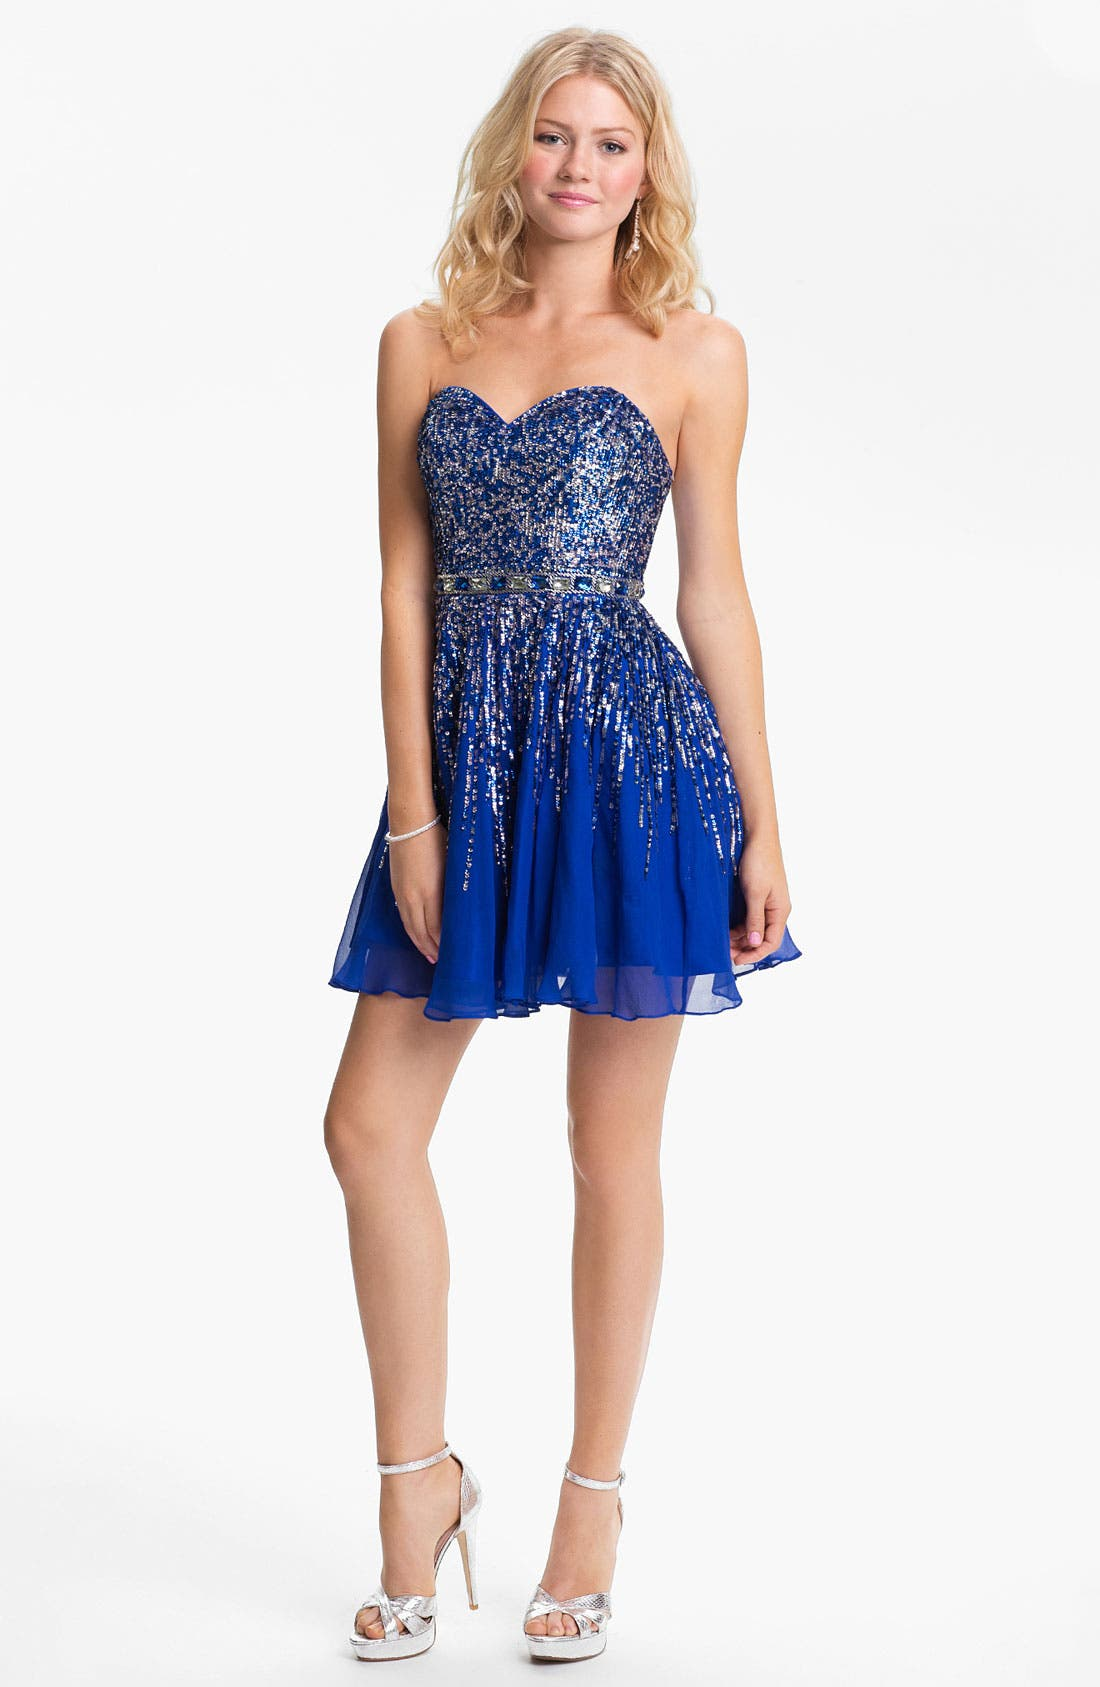 Alternate Image 1 Selected - Sherri Hill Embellished Sweetheart Fit & Flare Silk Dress (Online Only)